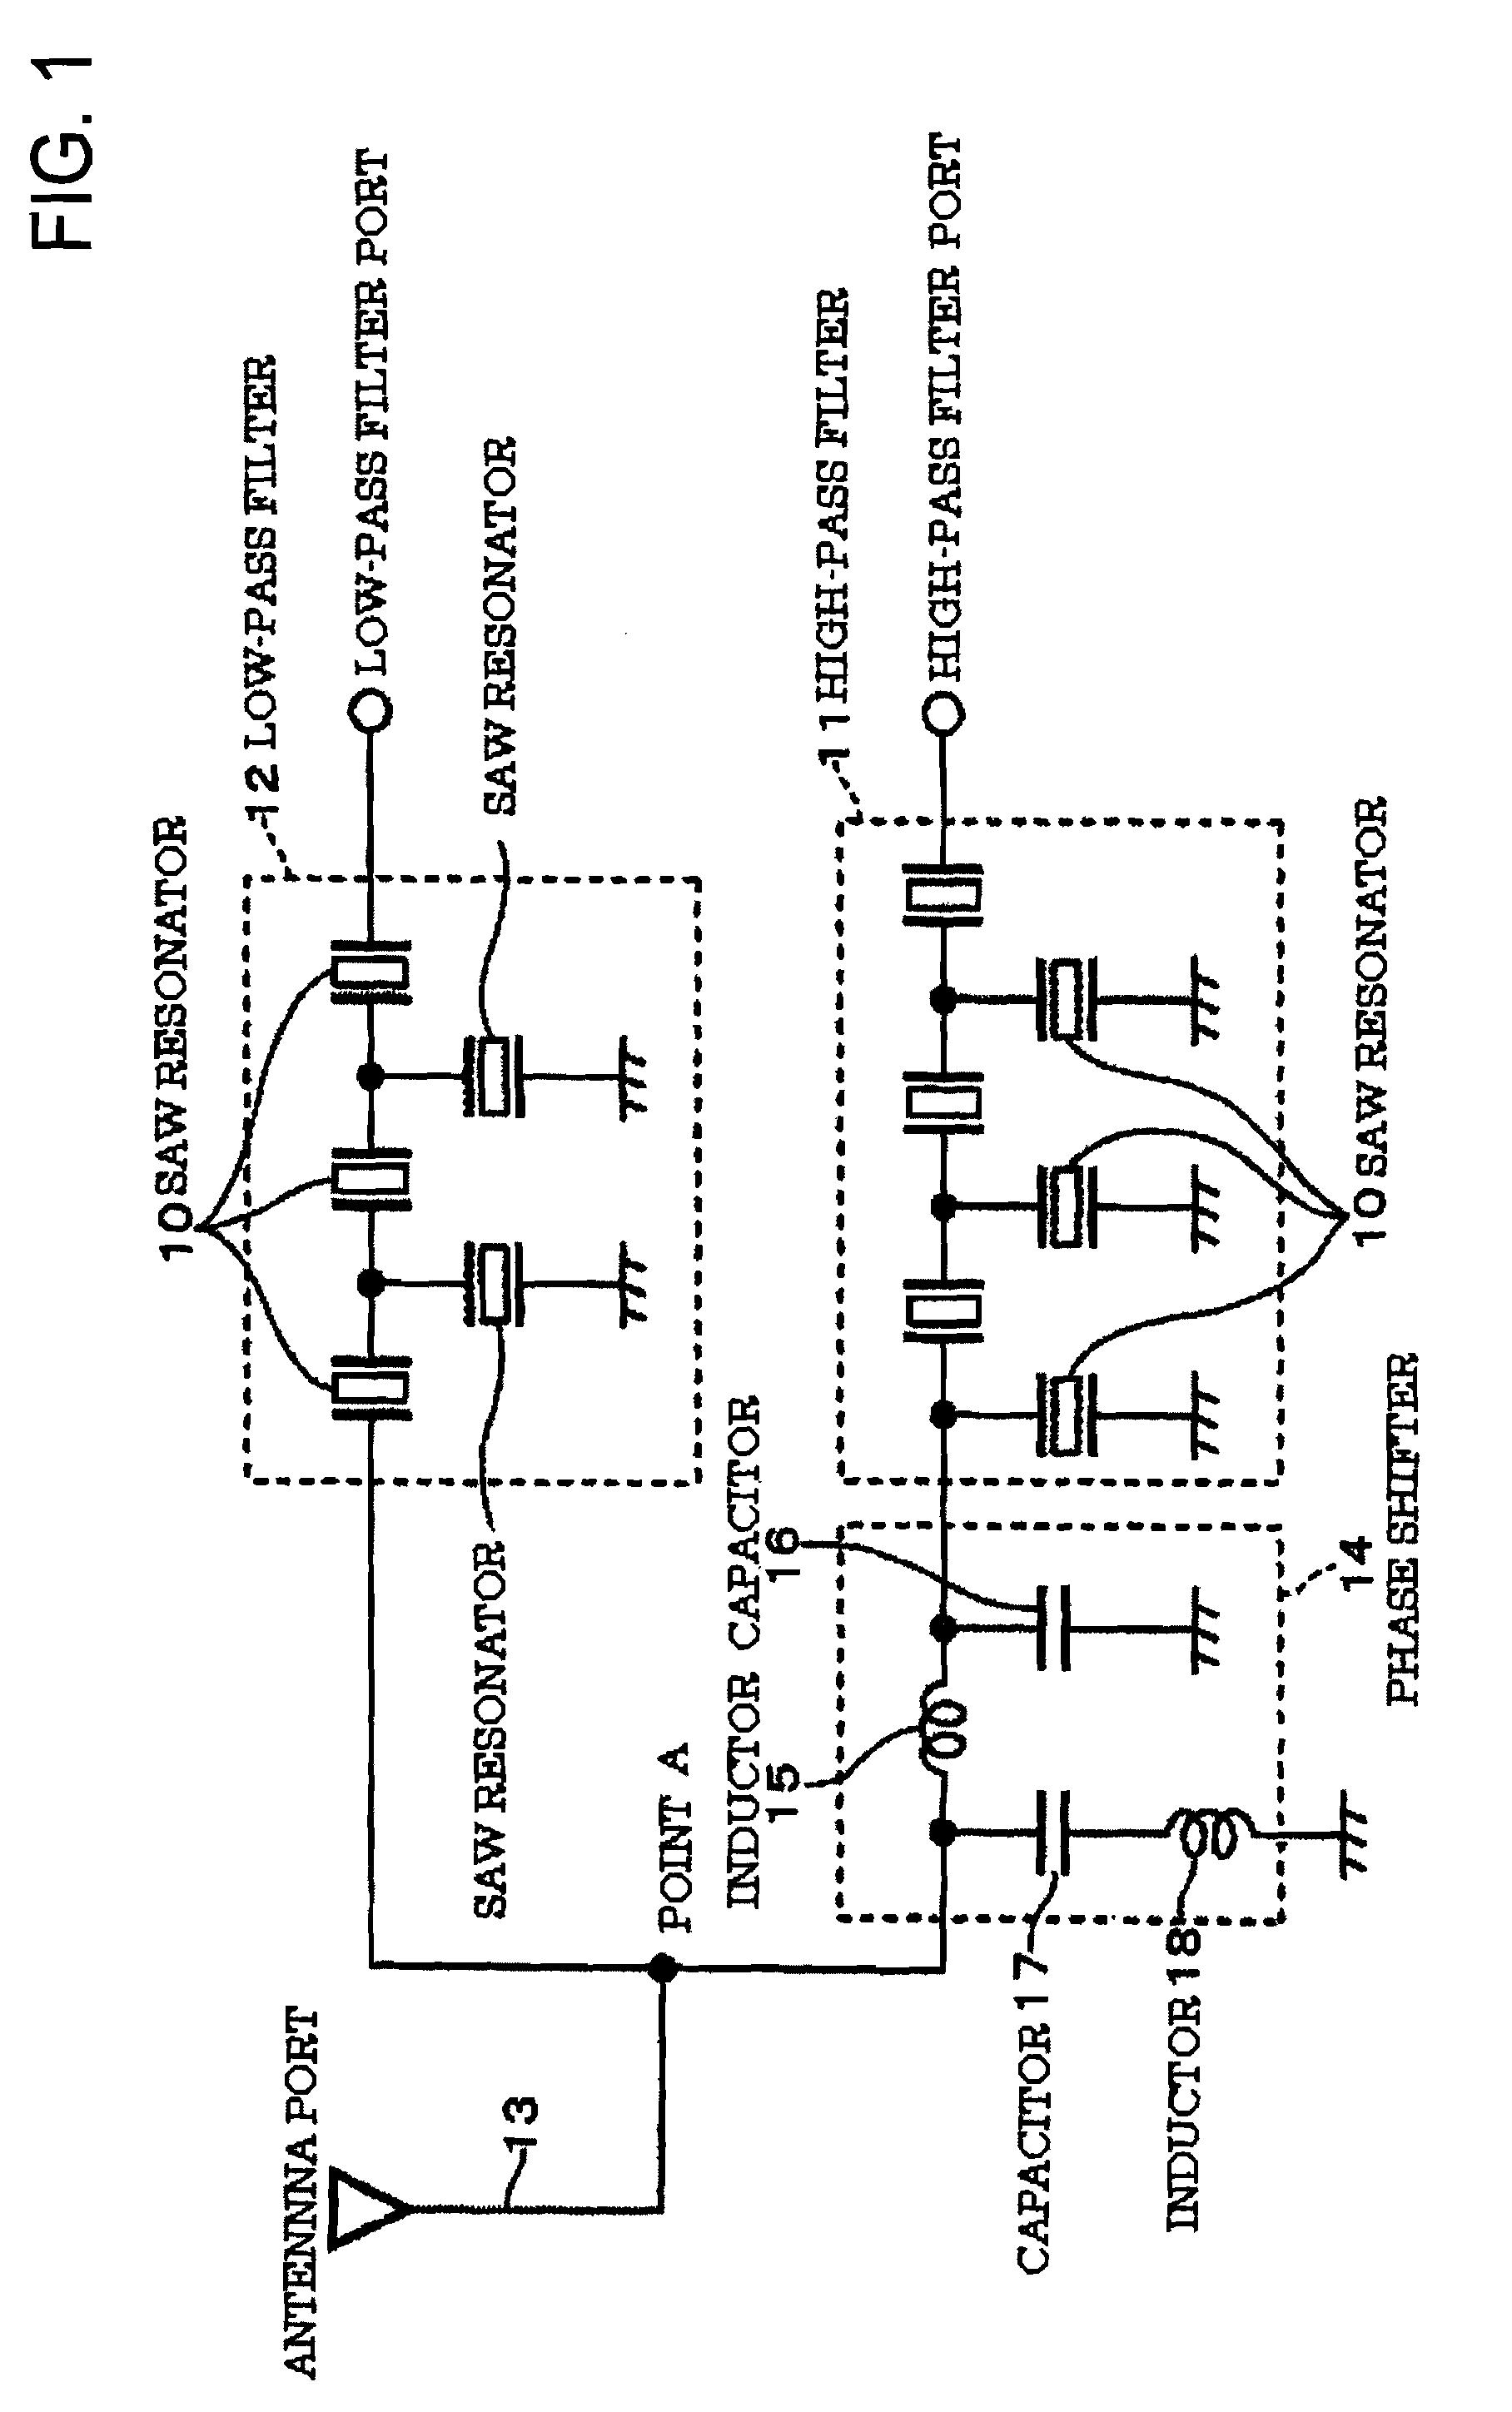 Patent Us7800461 Antenna Branching Filter Google Patents Capacitor Circuit Drawing